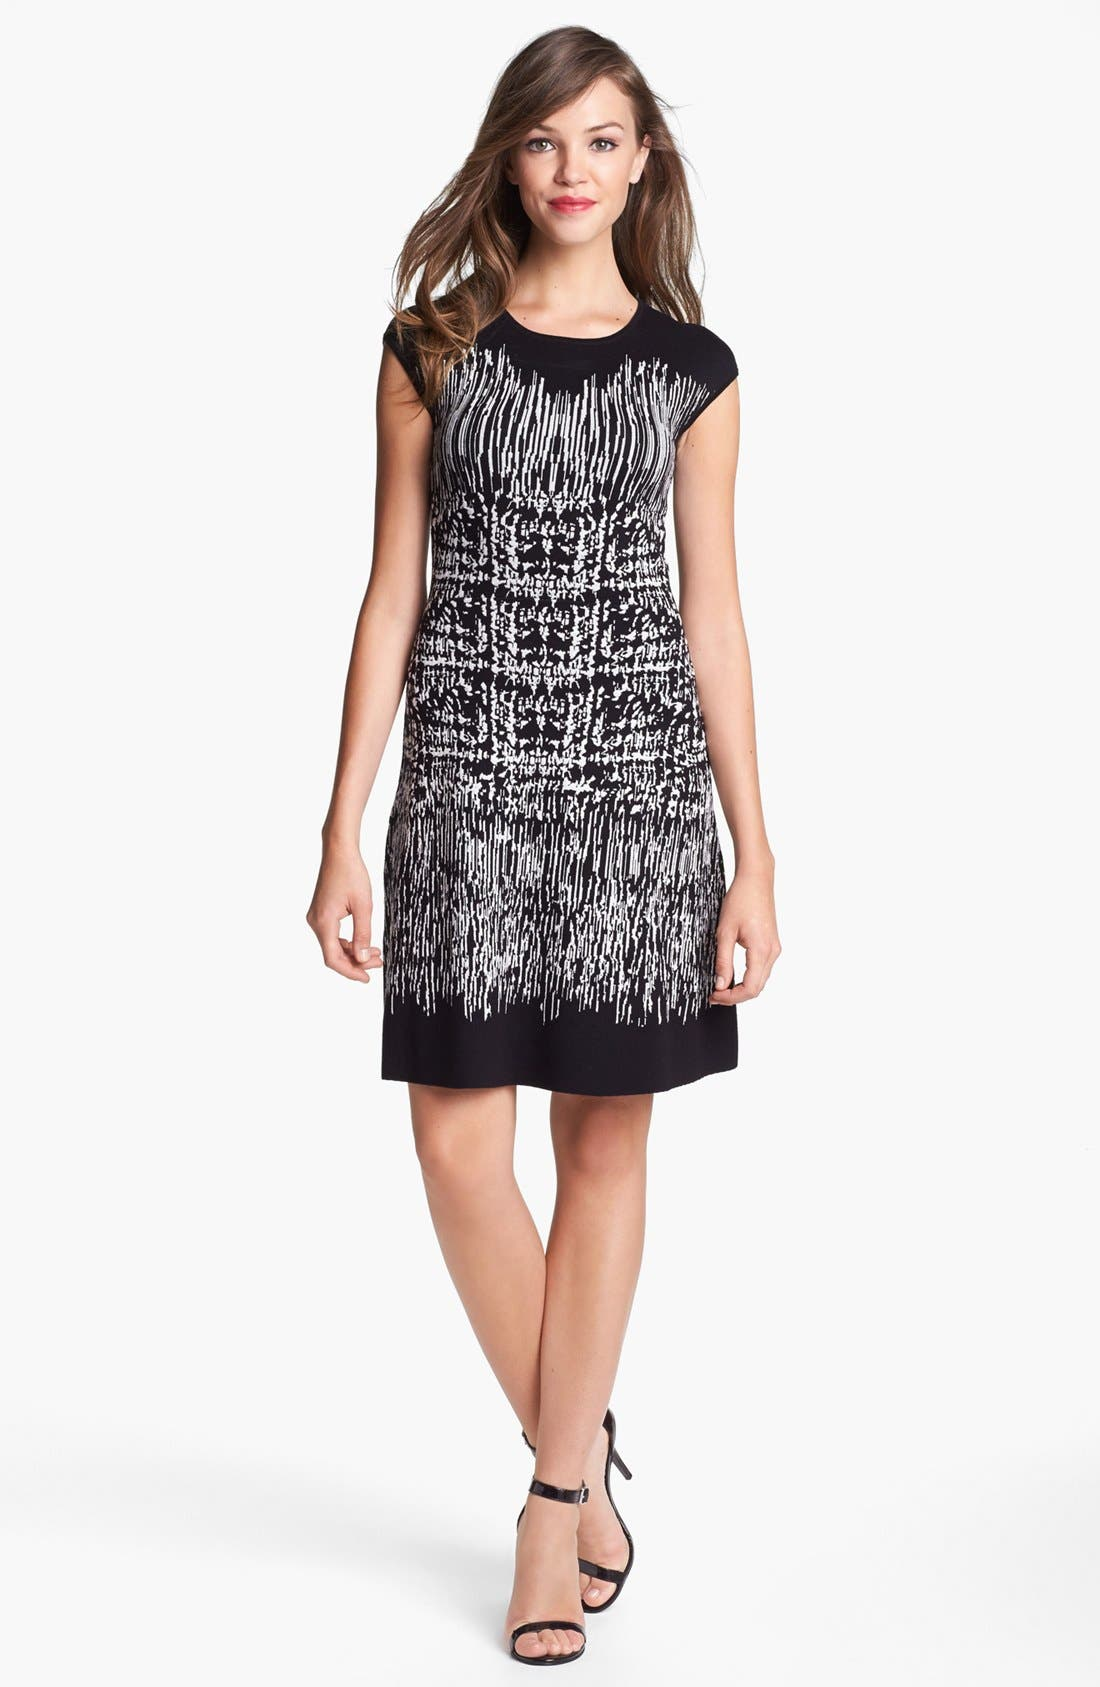 Alternate Image 1 Selected - BCBGMAXAZRIA Cap Sleeve Sweater Dress